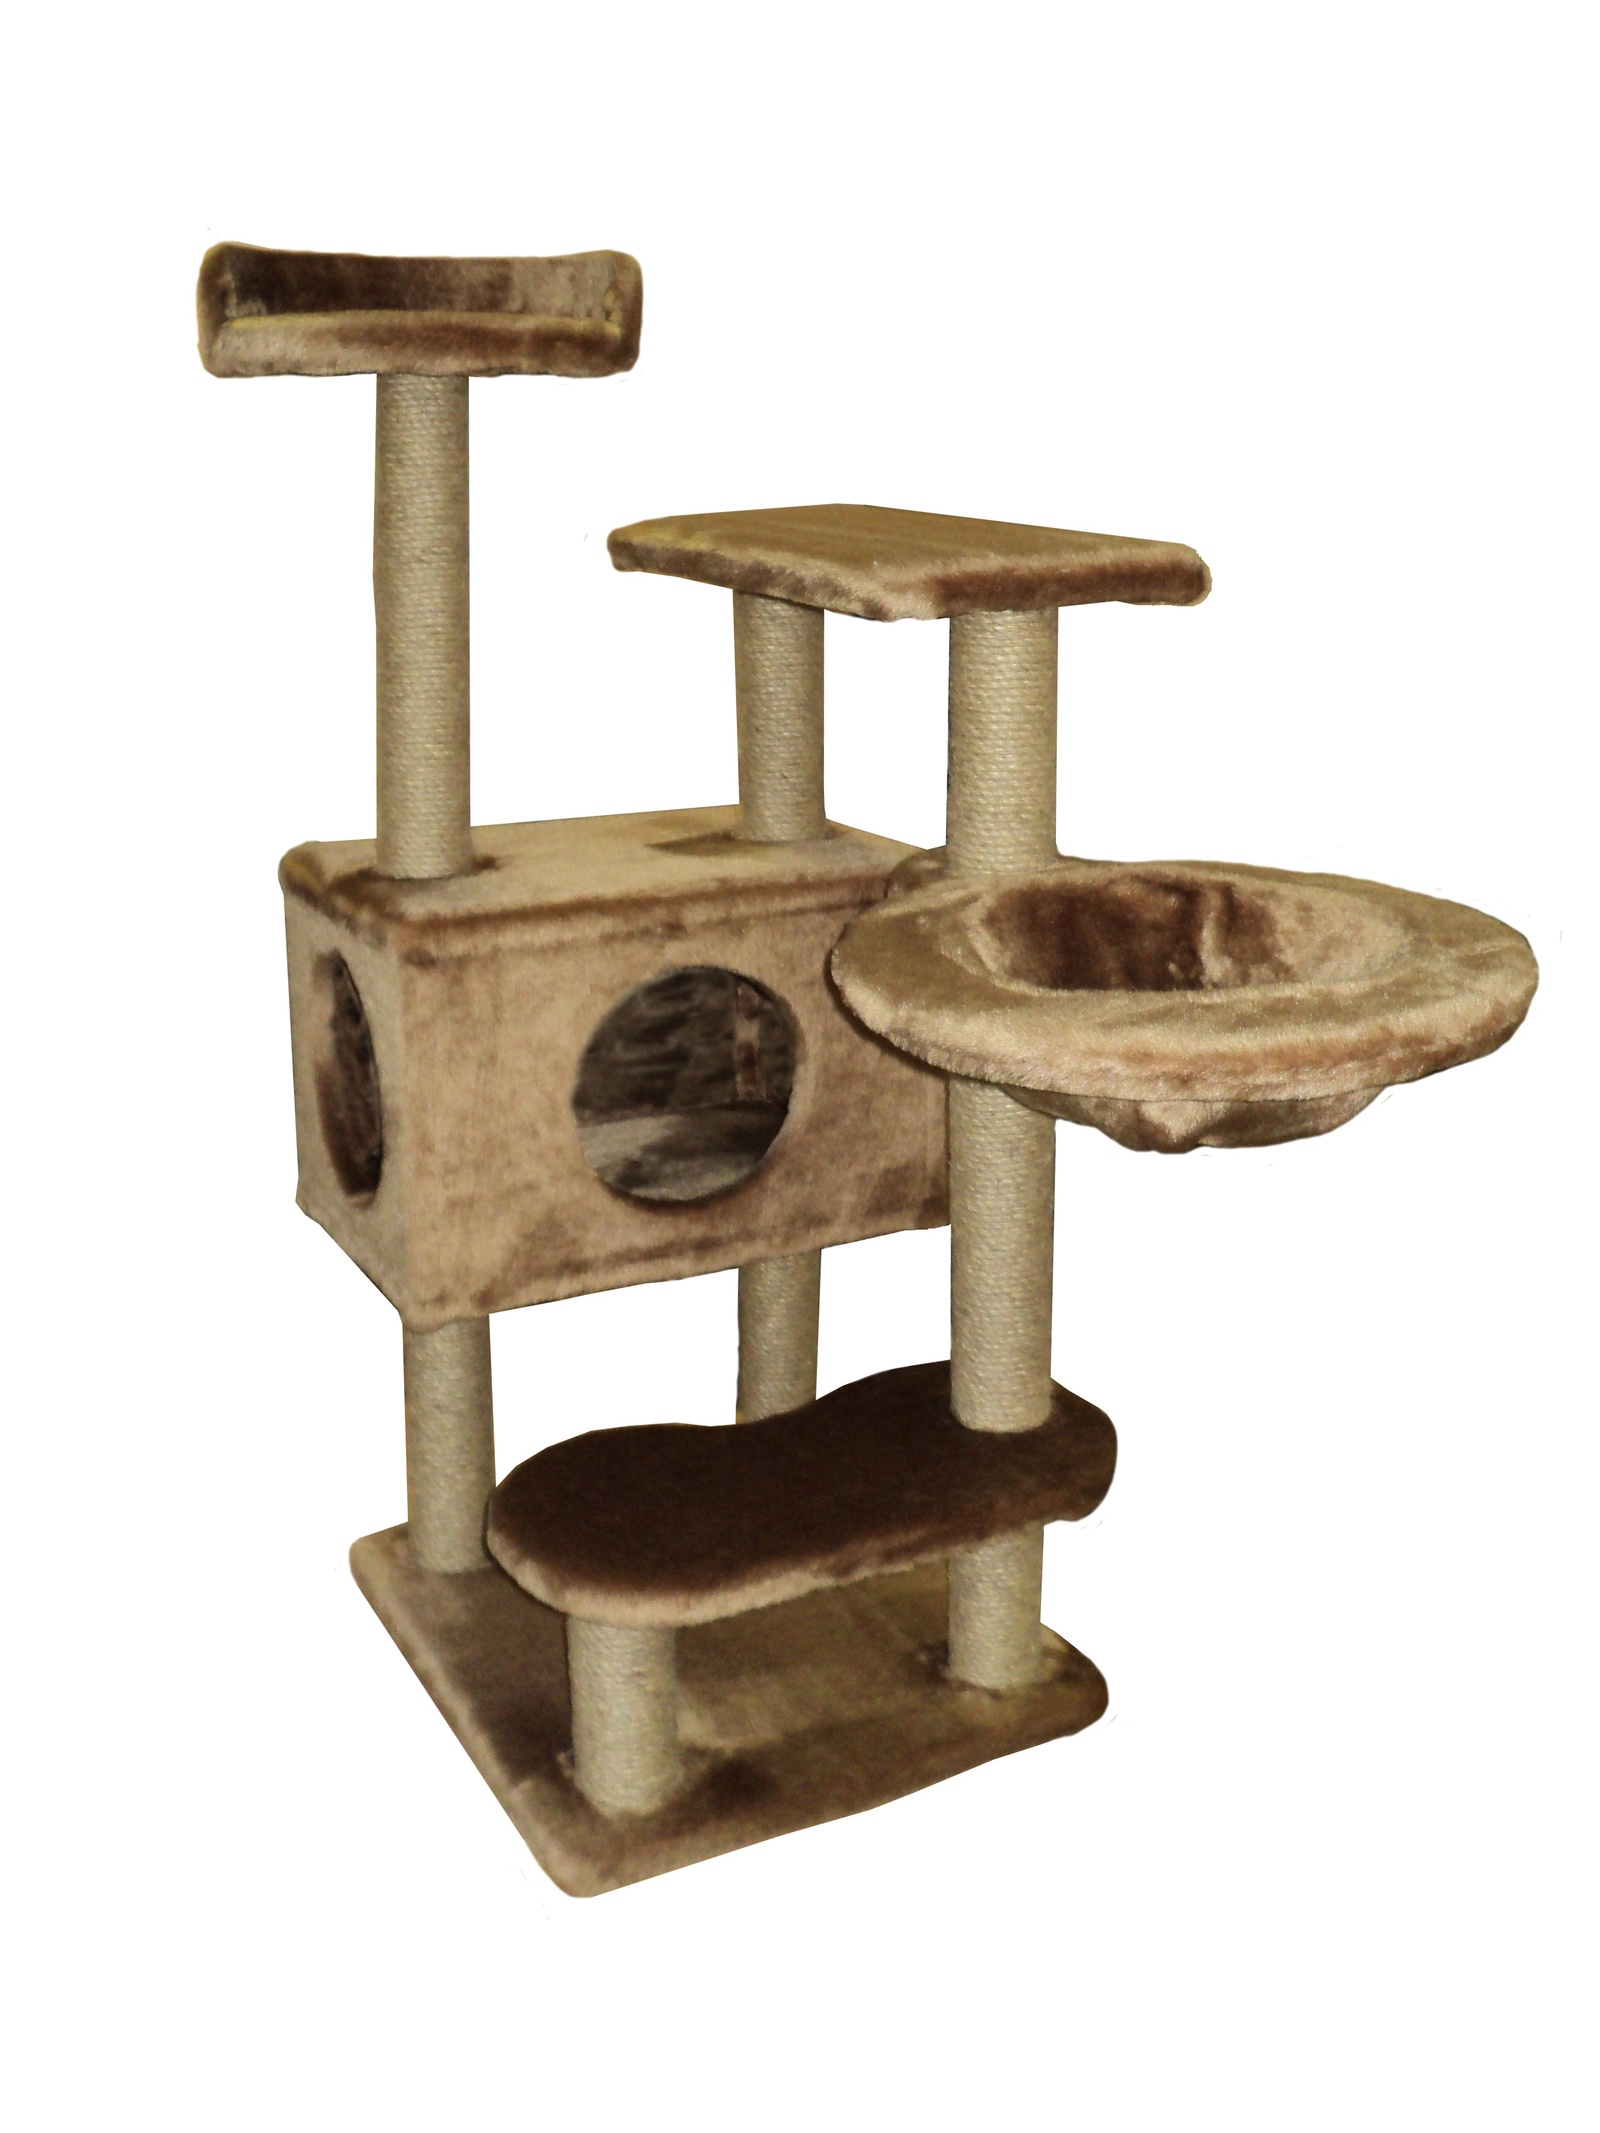 Домик - когтеточка Барсик, коричневый, джут 60х60х110 домик когтеточка барсик серый джут 60х60х110